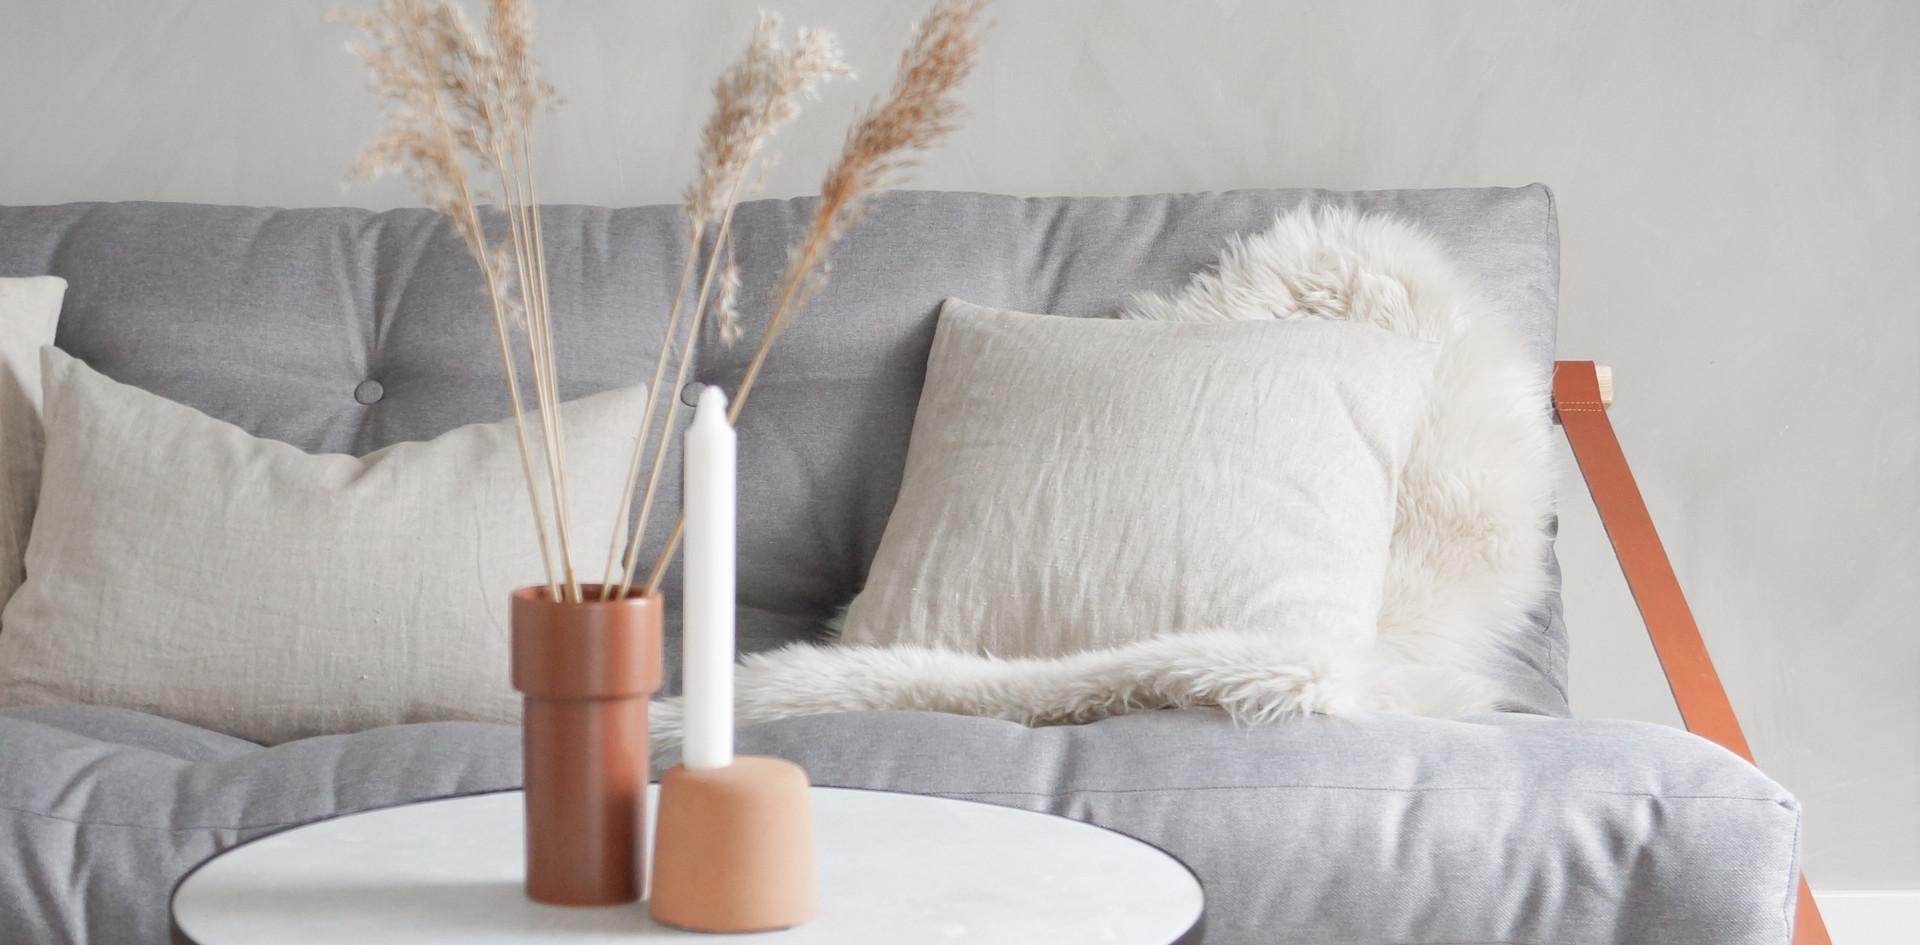 futon sofa bed, διπλός καναπές κρεβάτι με στρώμα φουτόν